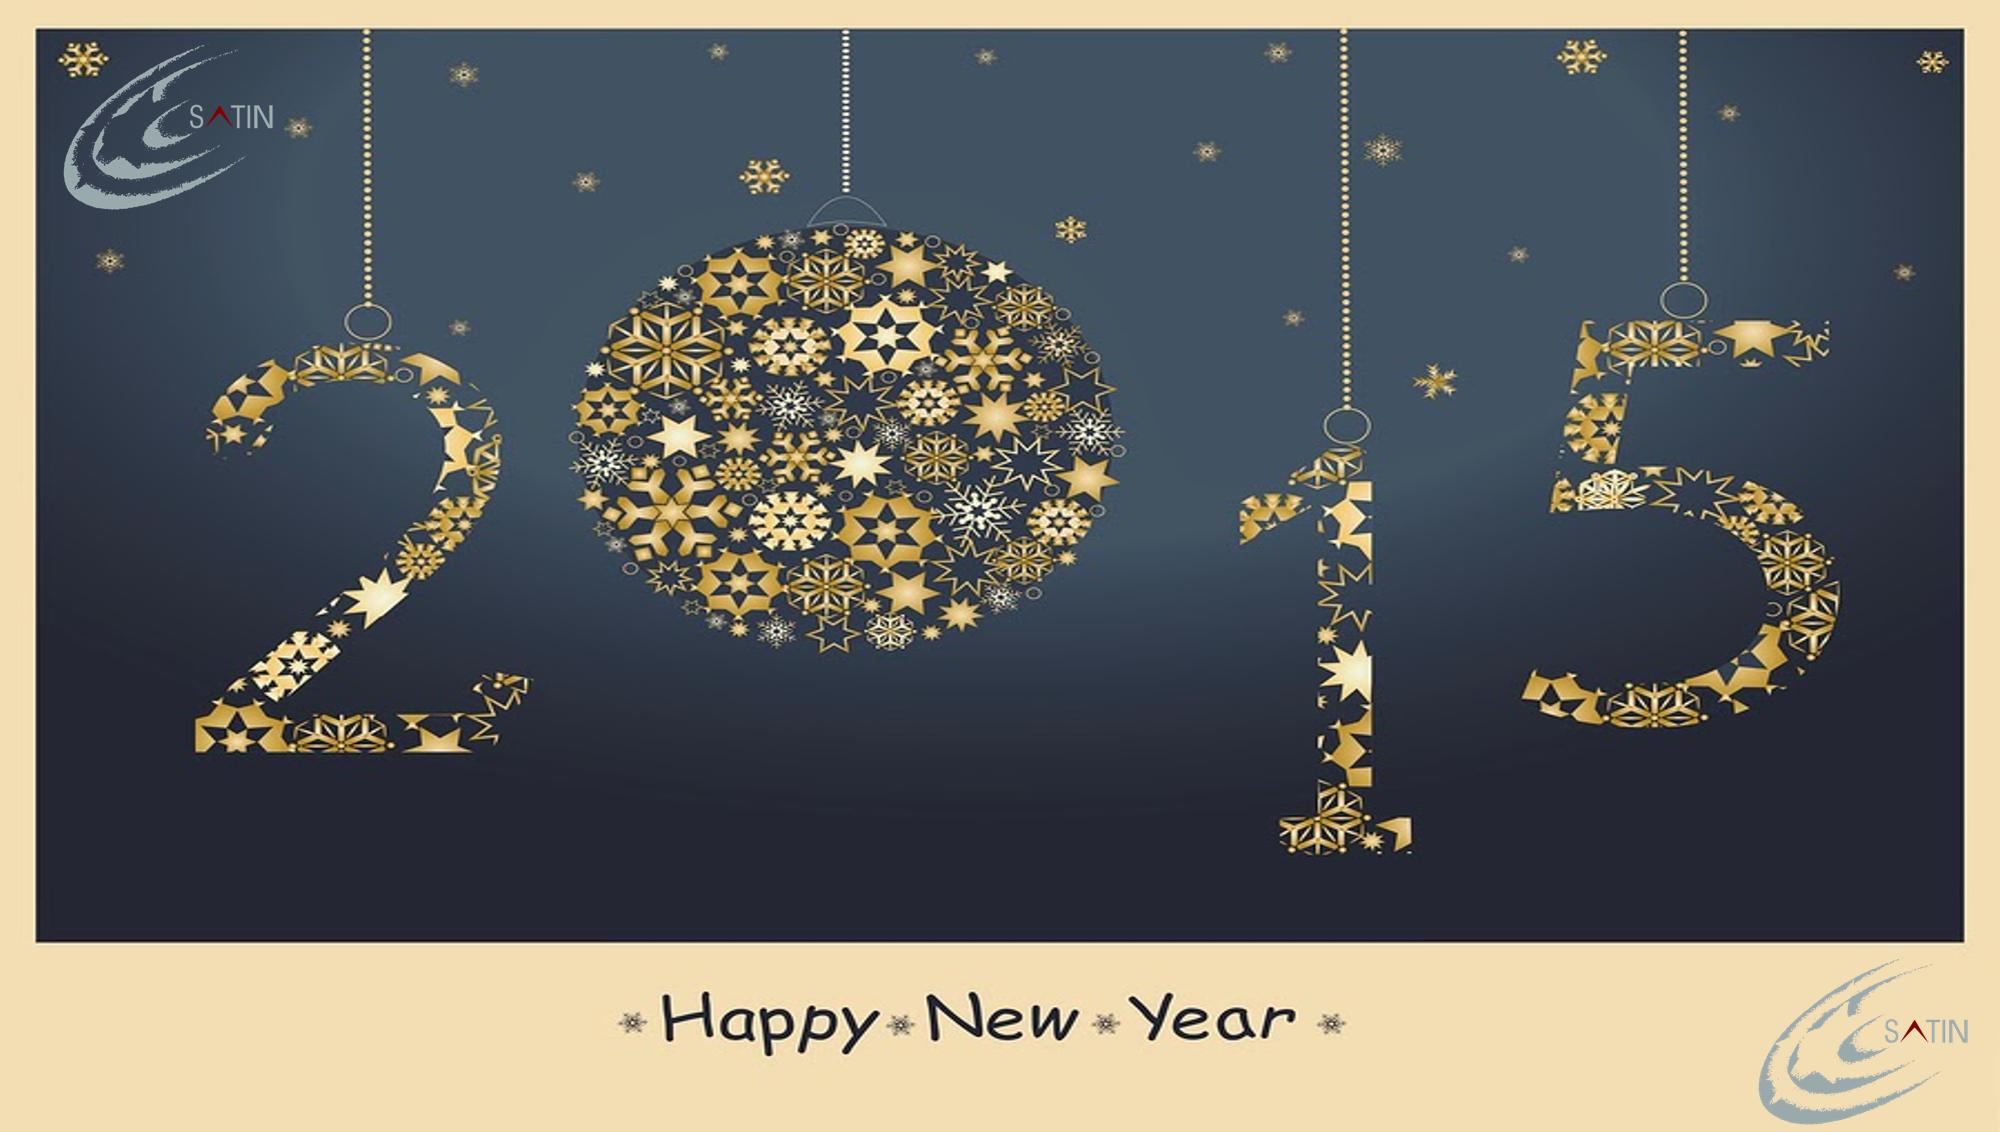 New Year Greetings From Scnl Scnls Quarterly Newsletter Pinterest